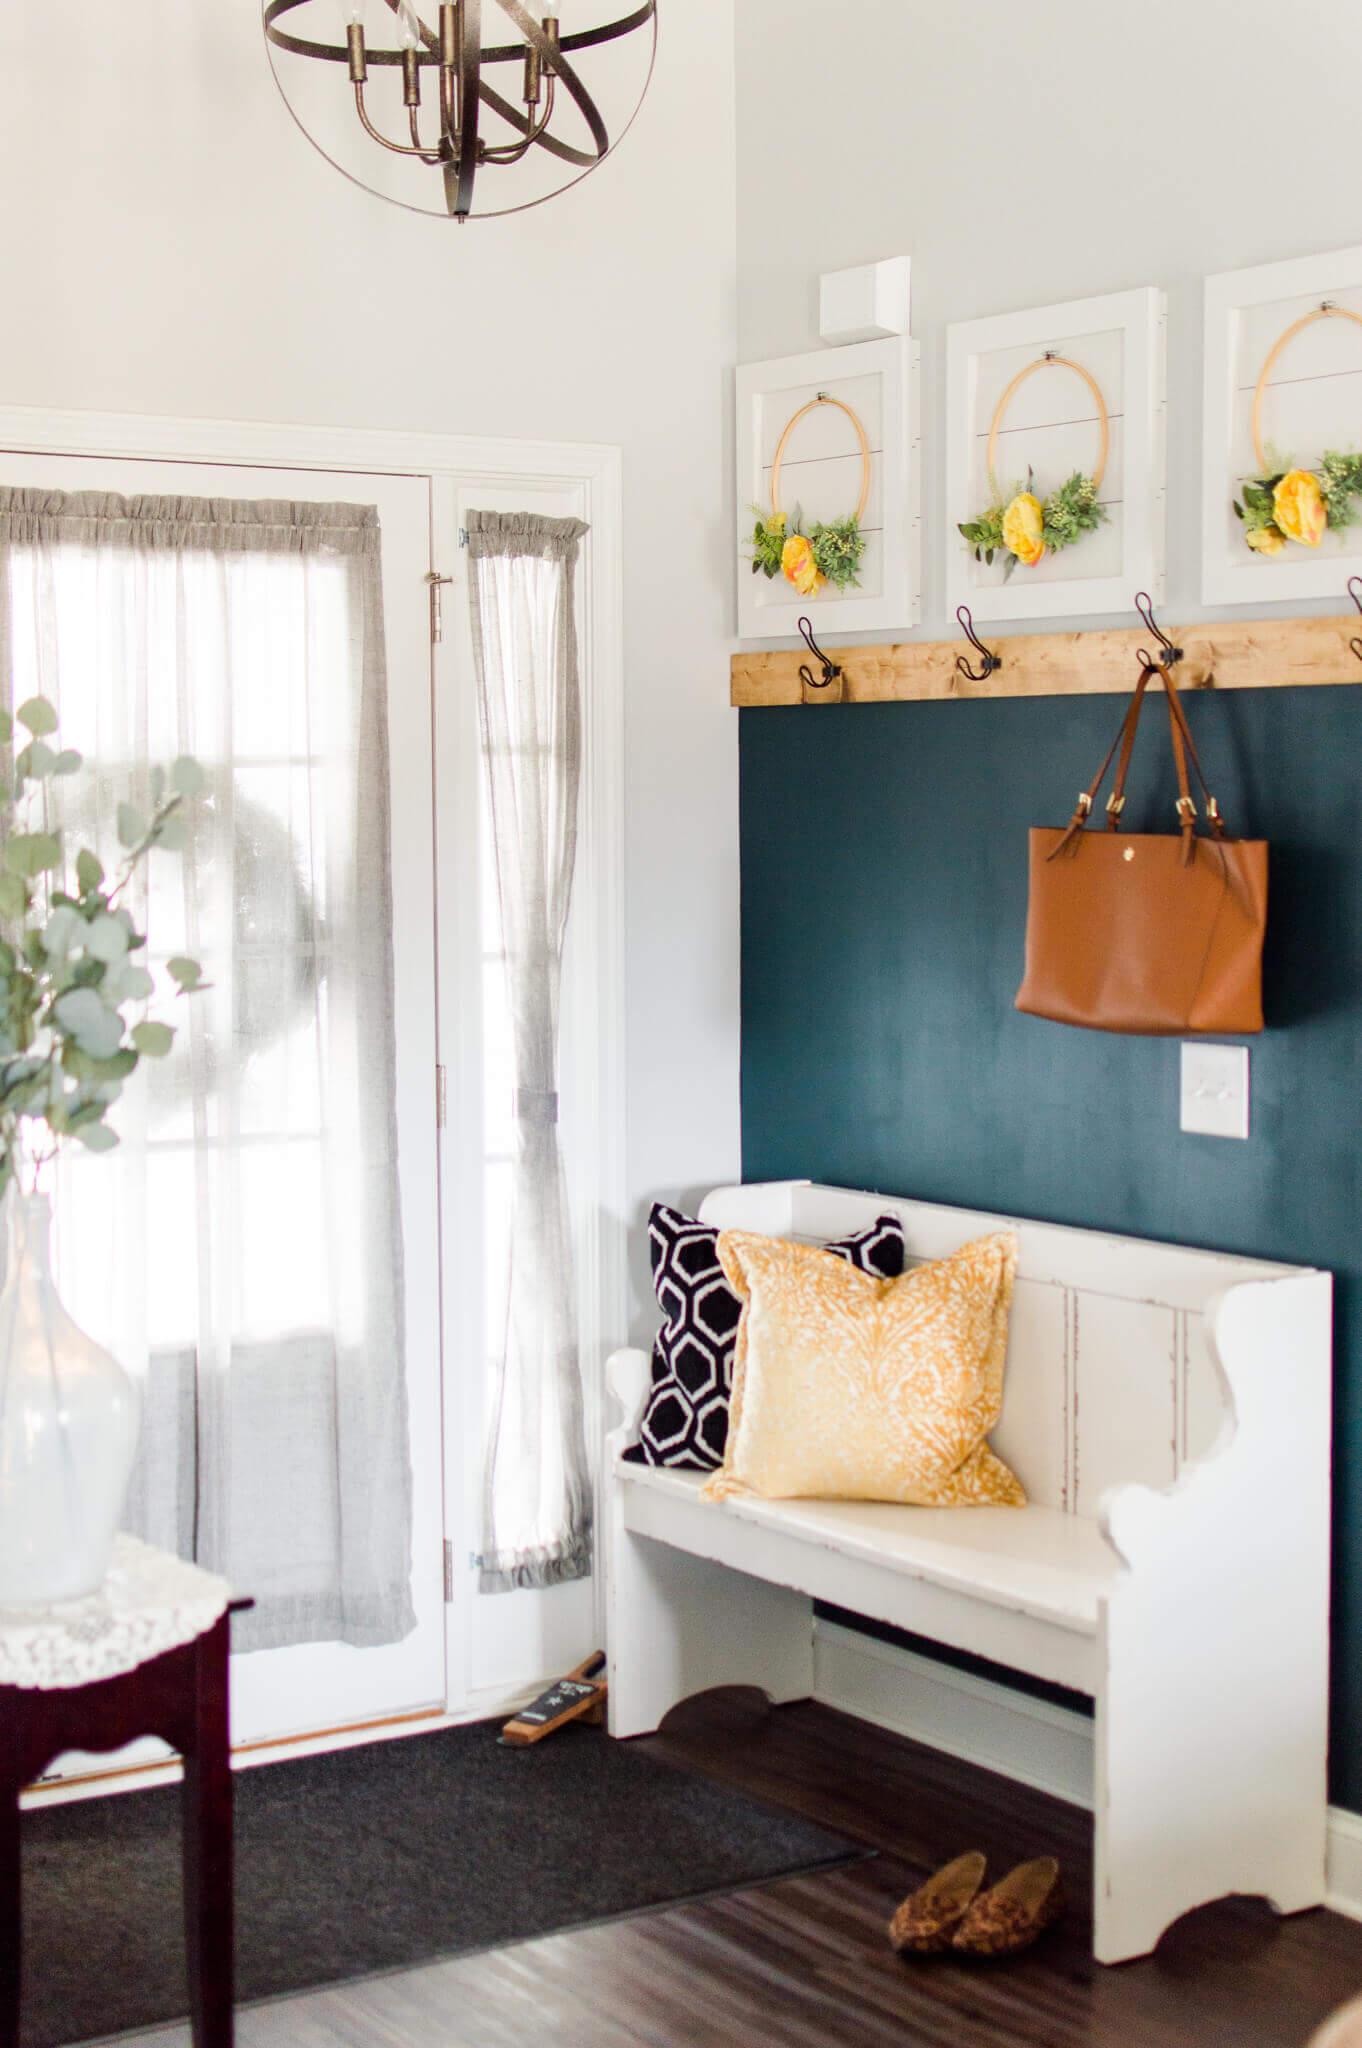 DIY Easy Entryway Makeover / A Hosting Home Blog